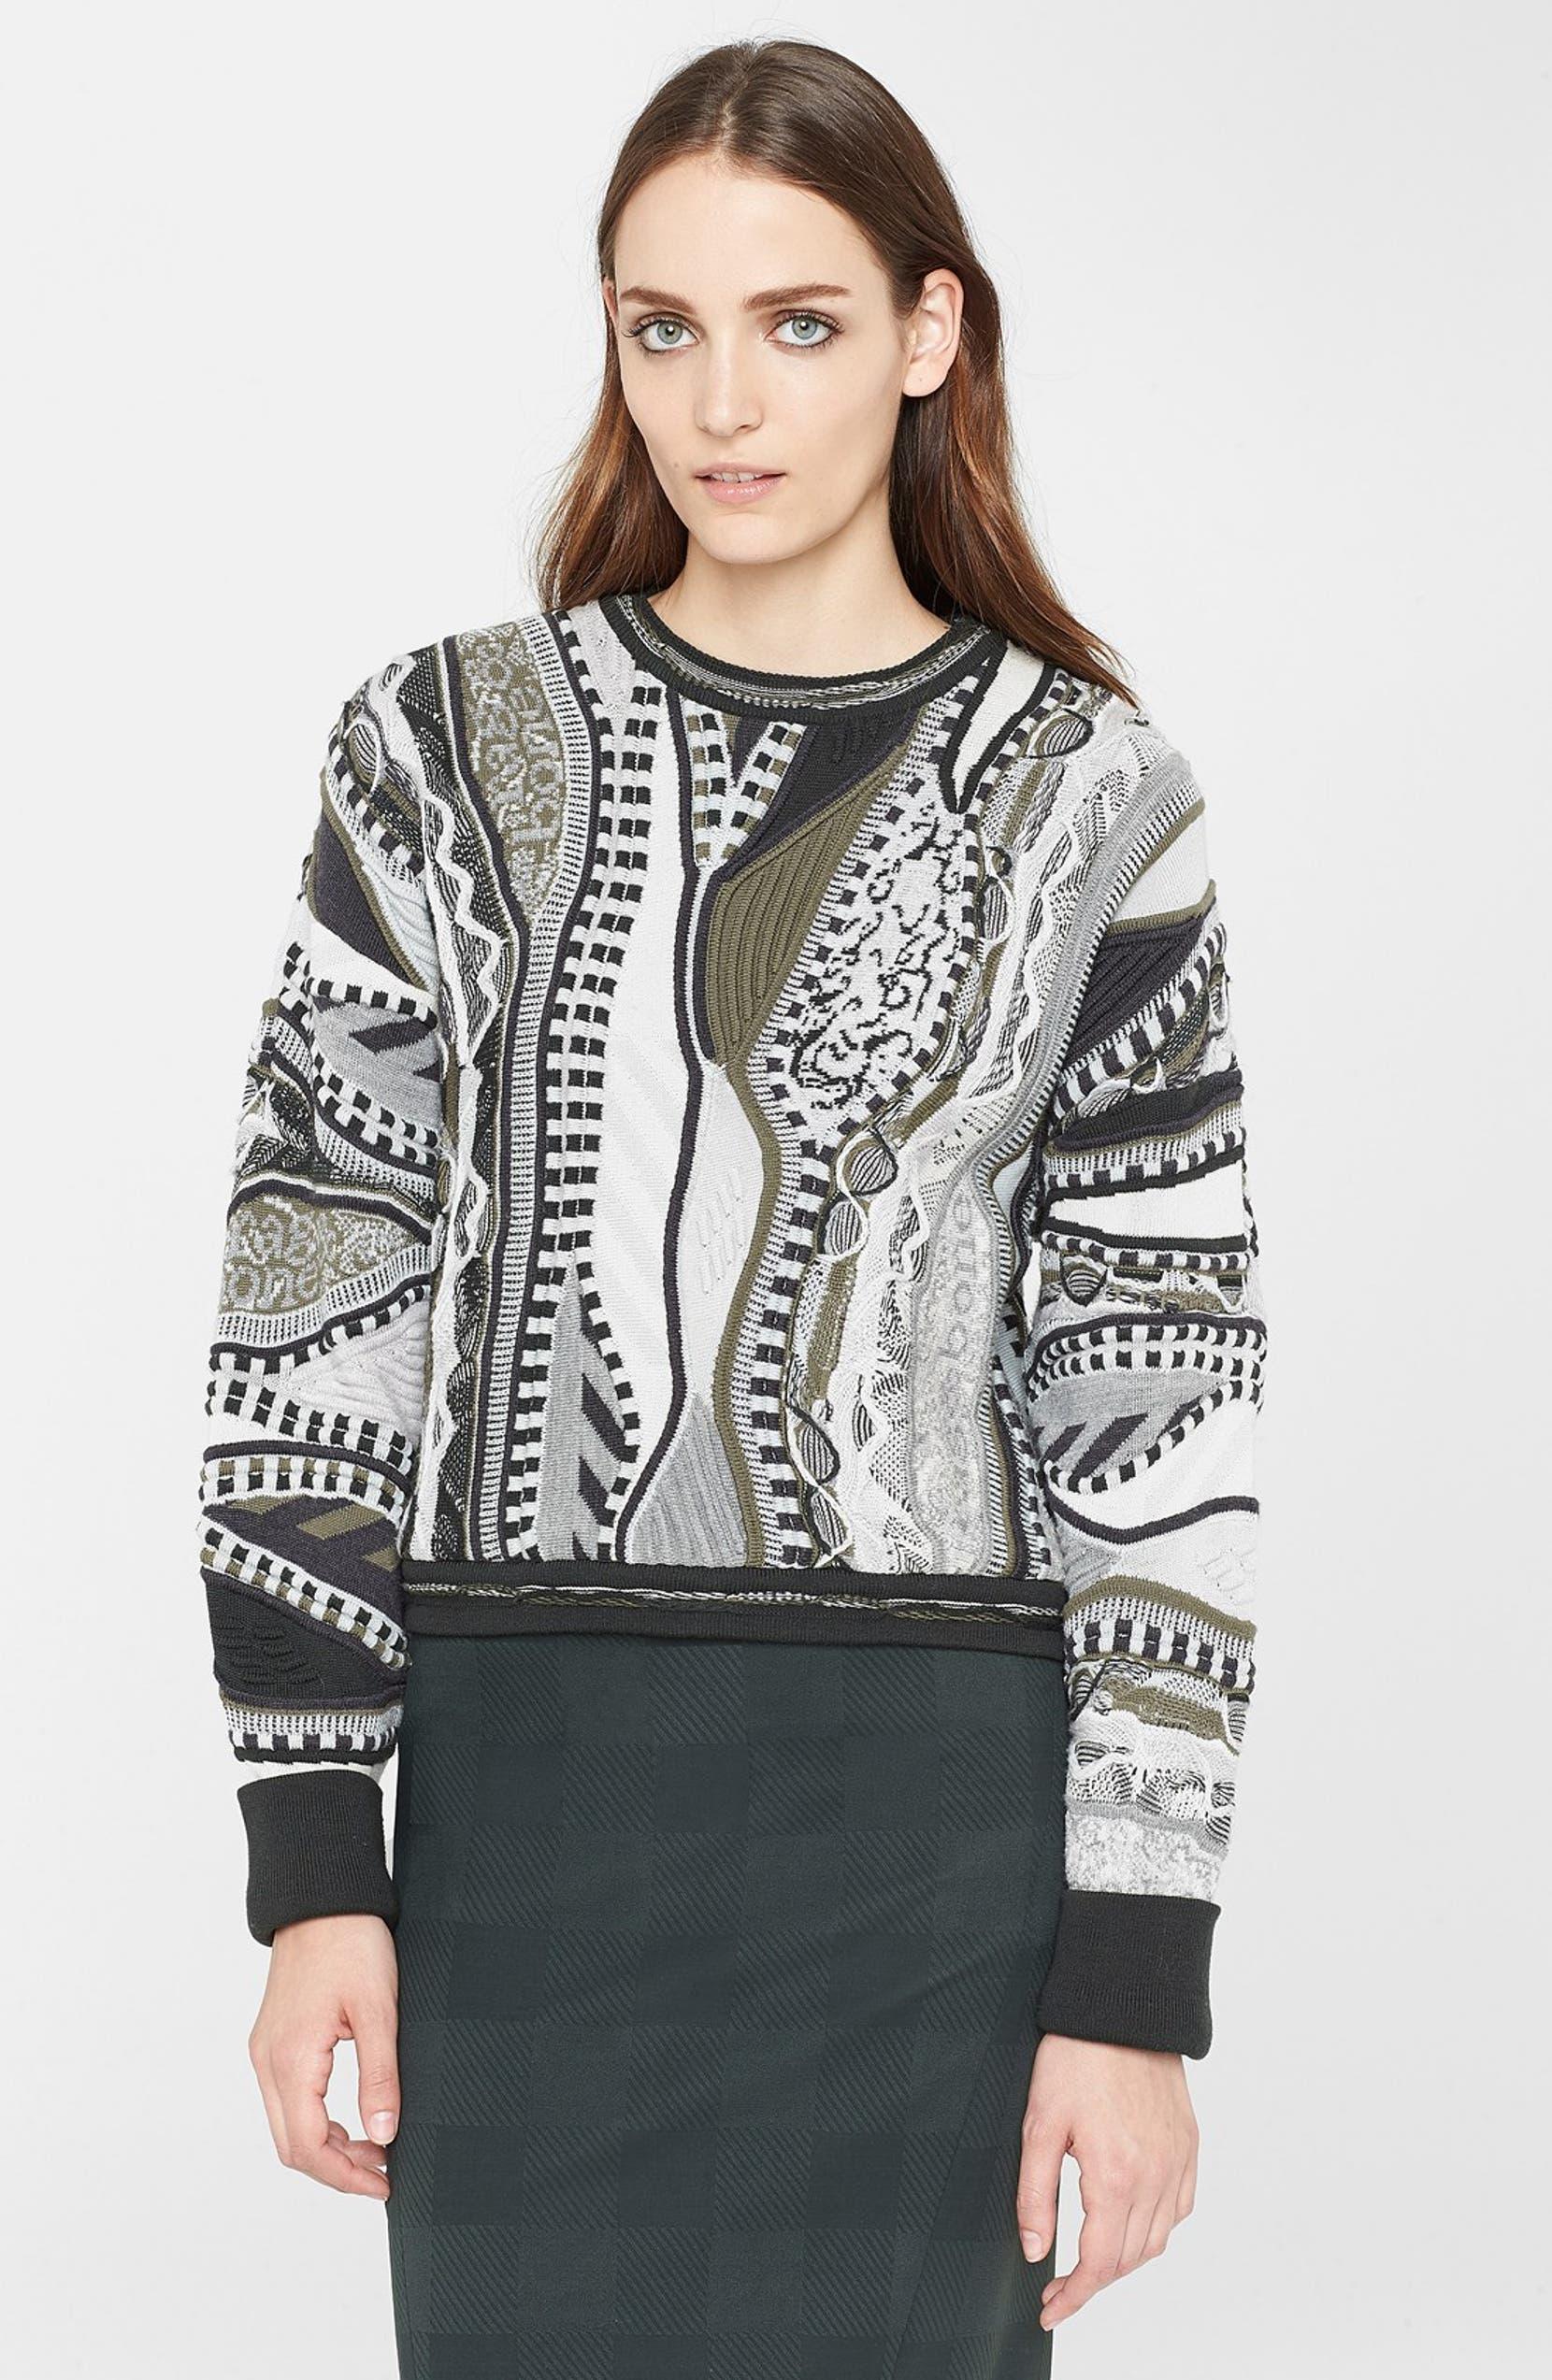 x Coogi Crop Sweater